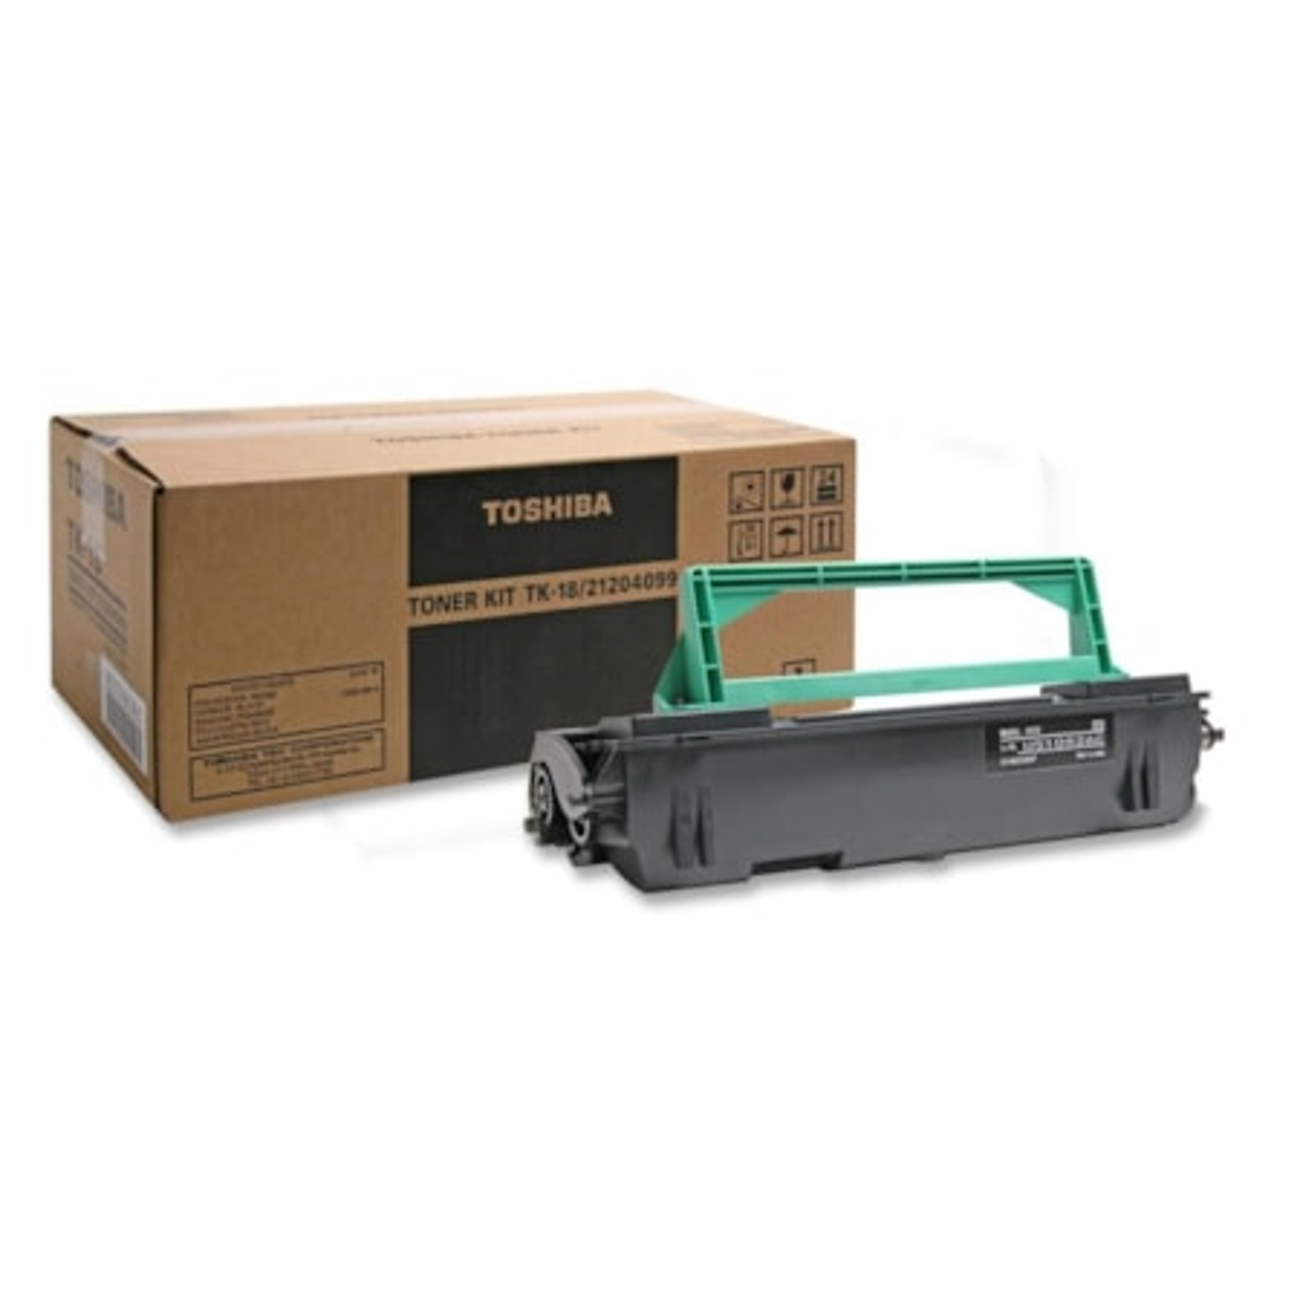 Toshiba TK18 Toner Cartridge - Black